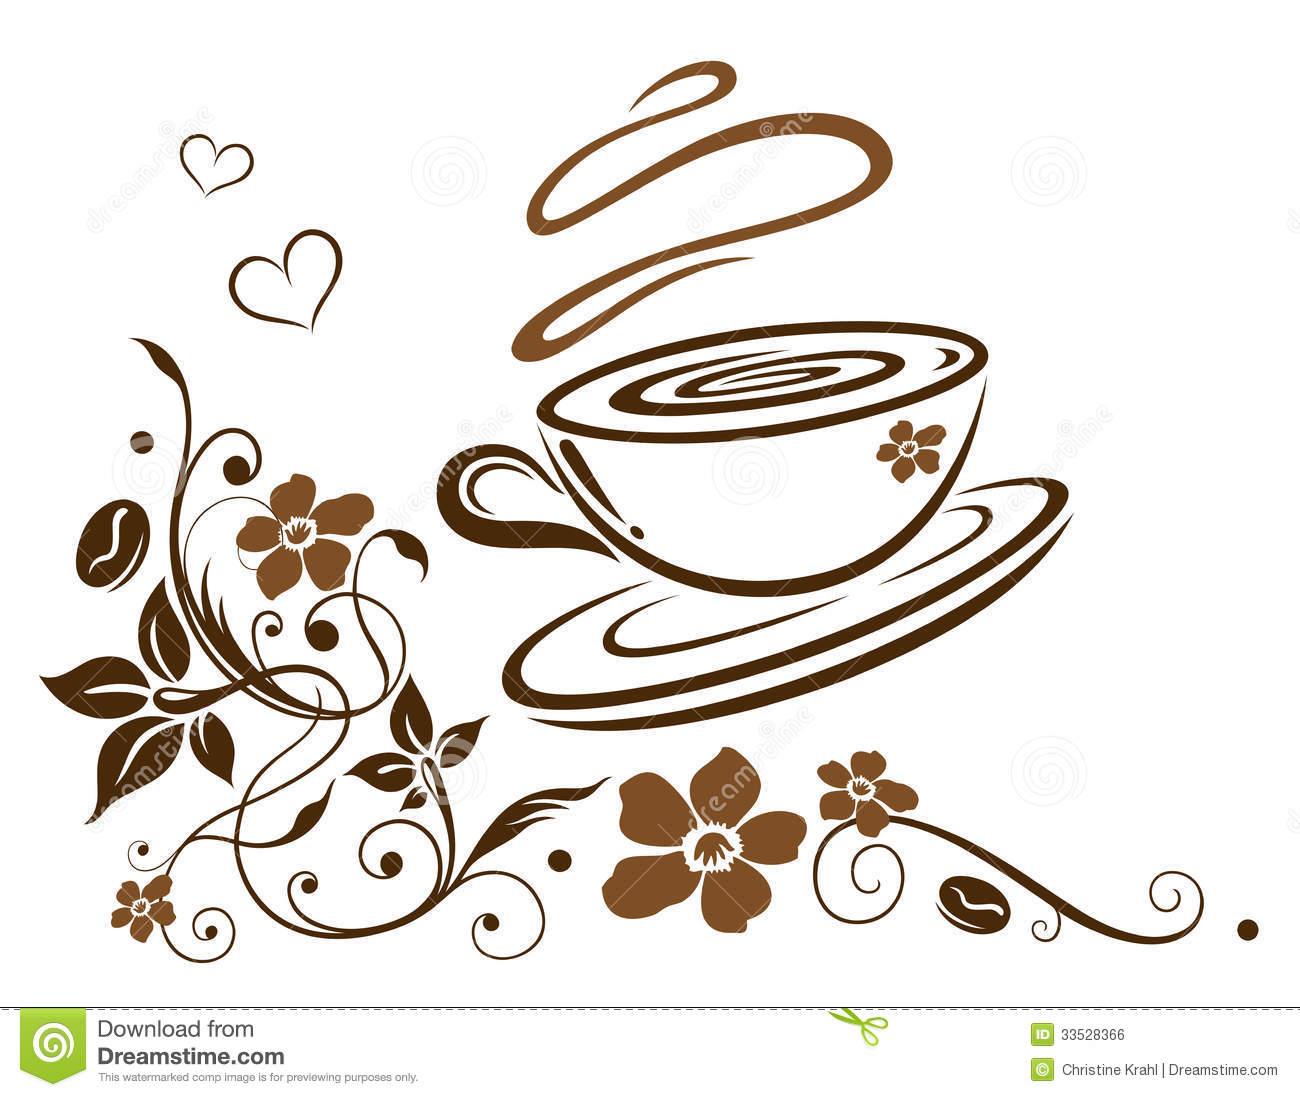 44+ Tea Cup Wallpaper Border on WallpaperSafari